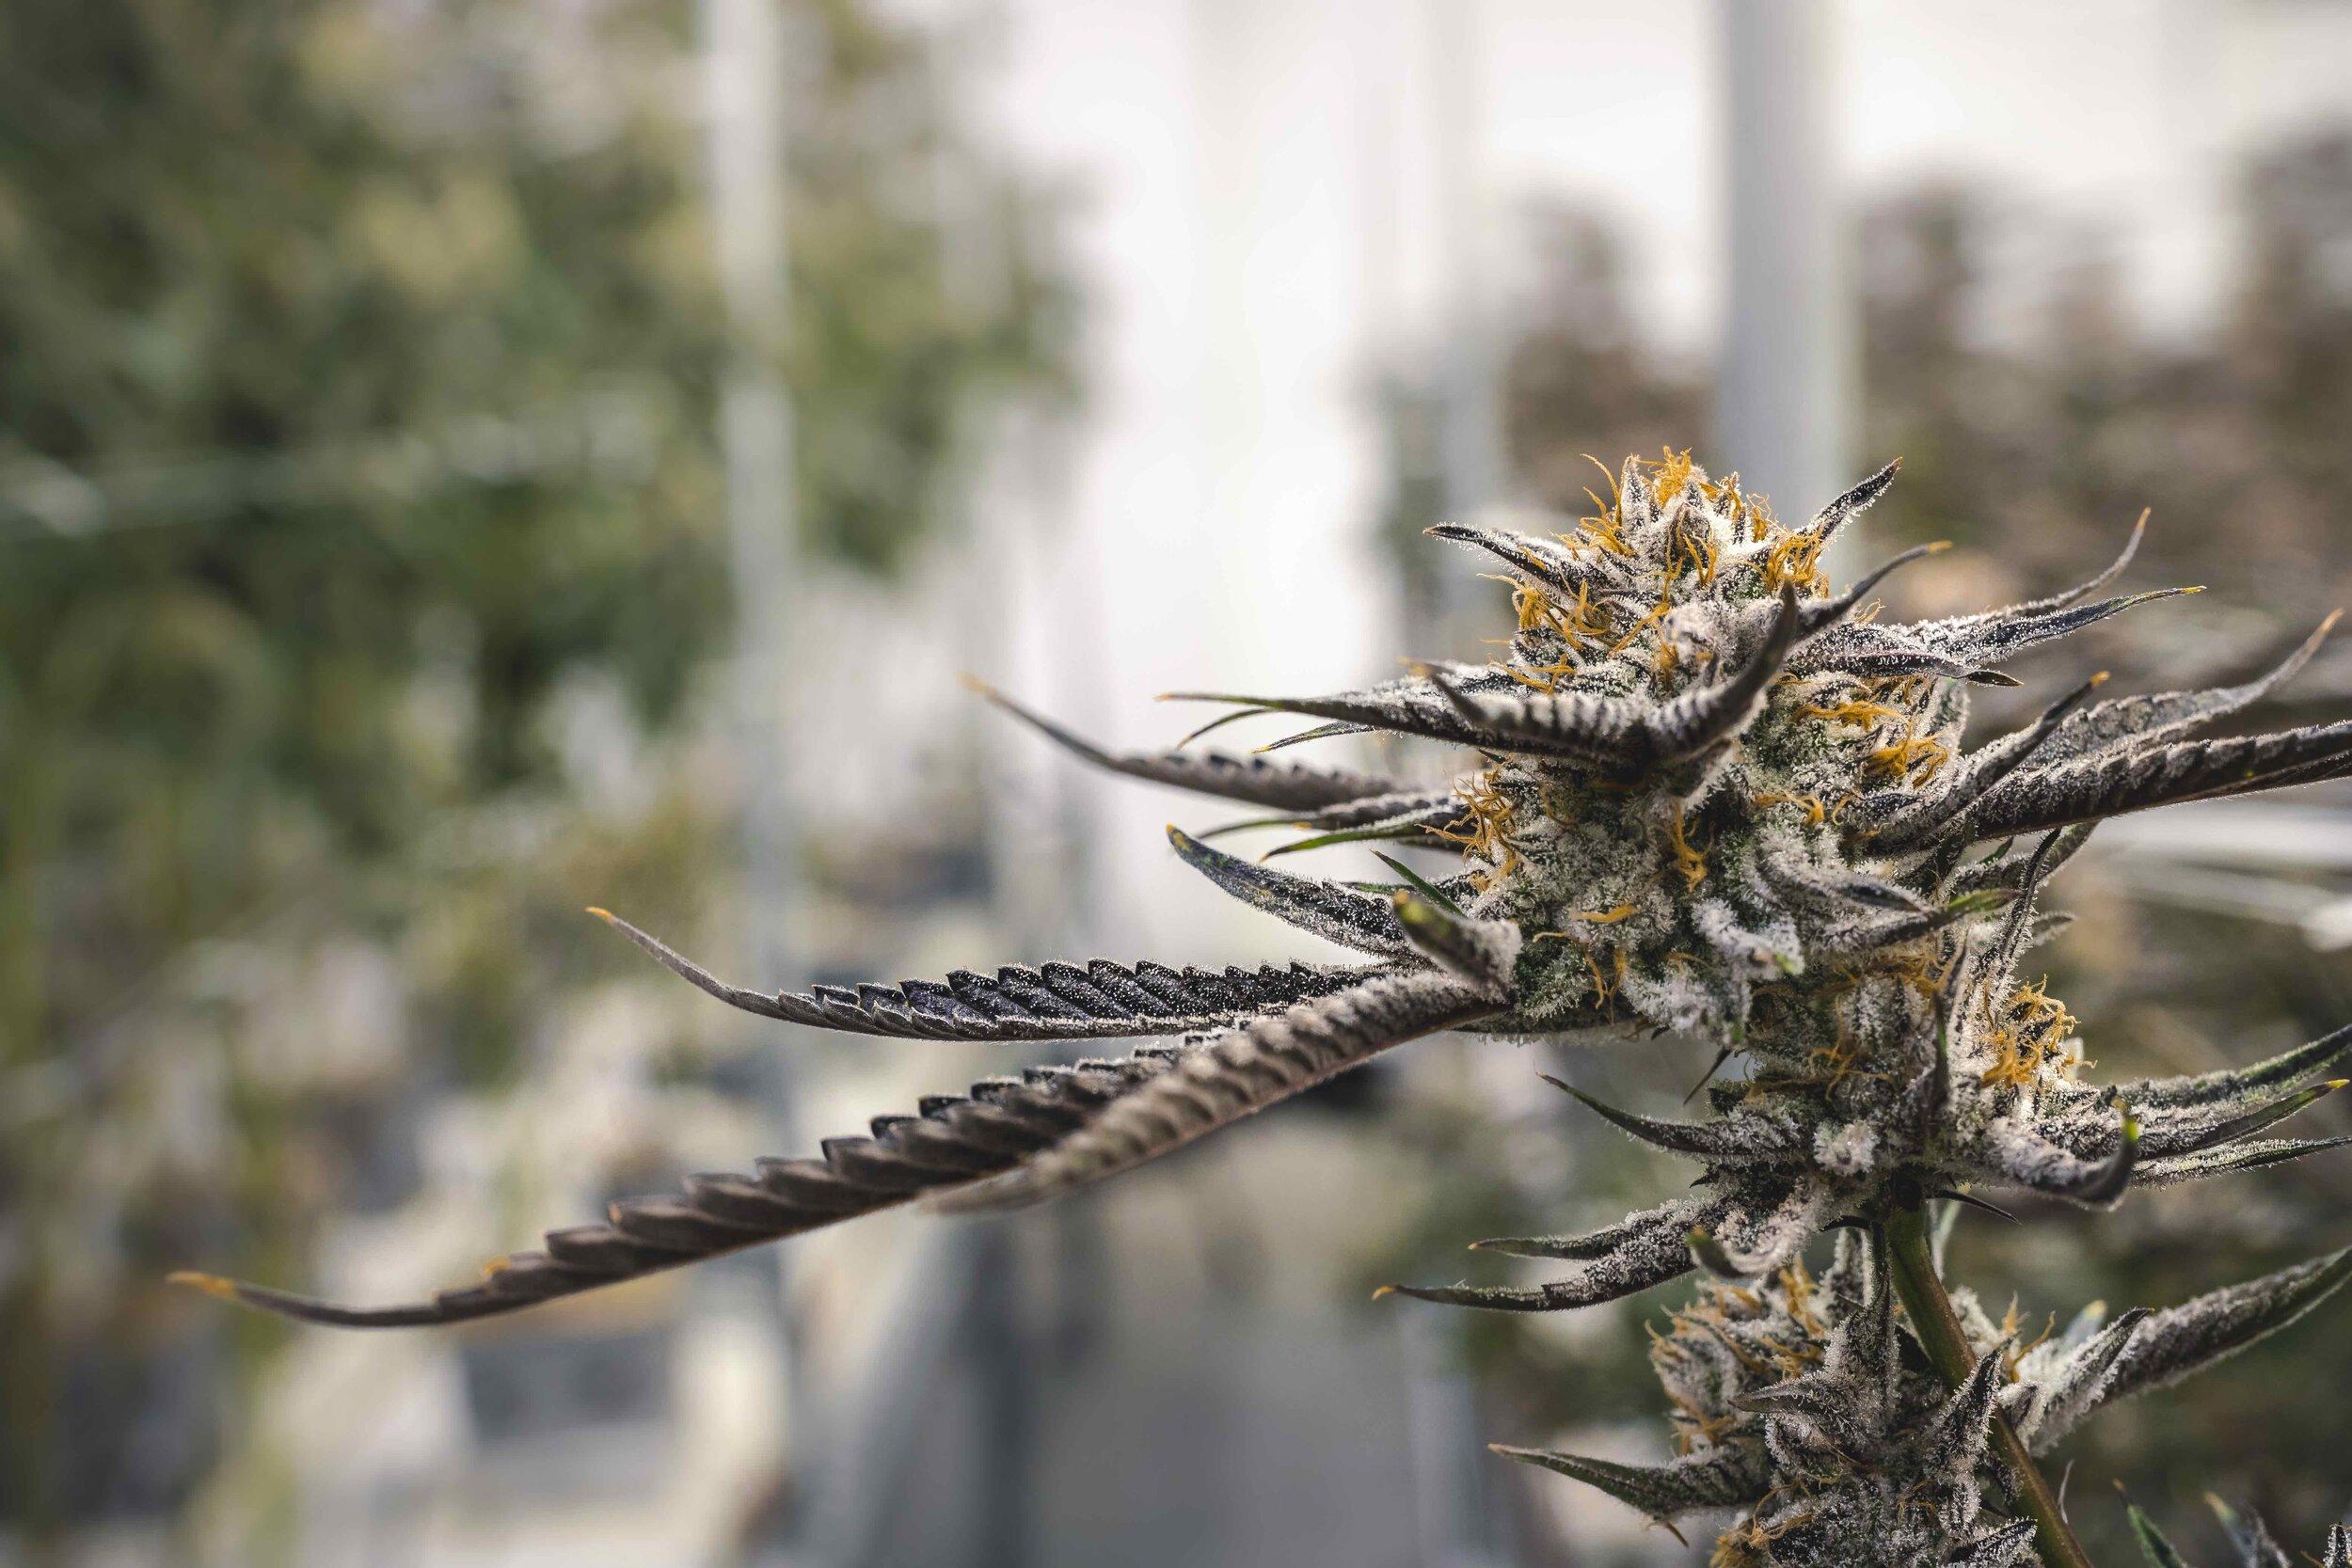 Orange_Hairs_on_Close_Up_Marijuana_Bud_at_Indoor_Commercial_Grow_Operation.jpeg